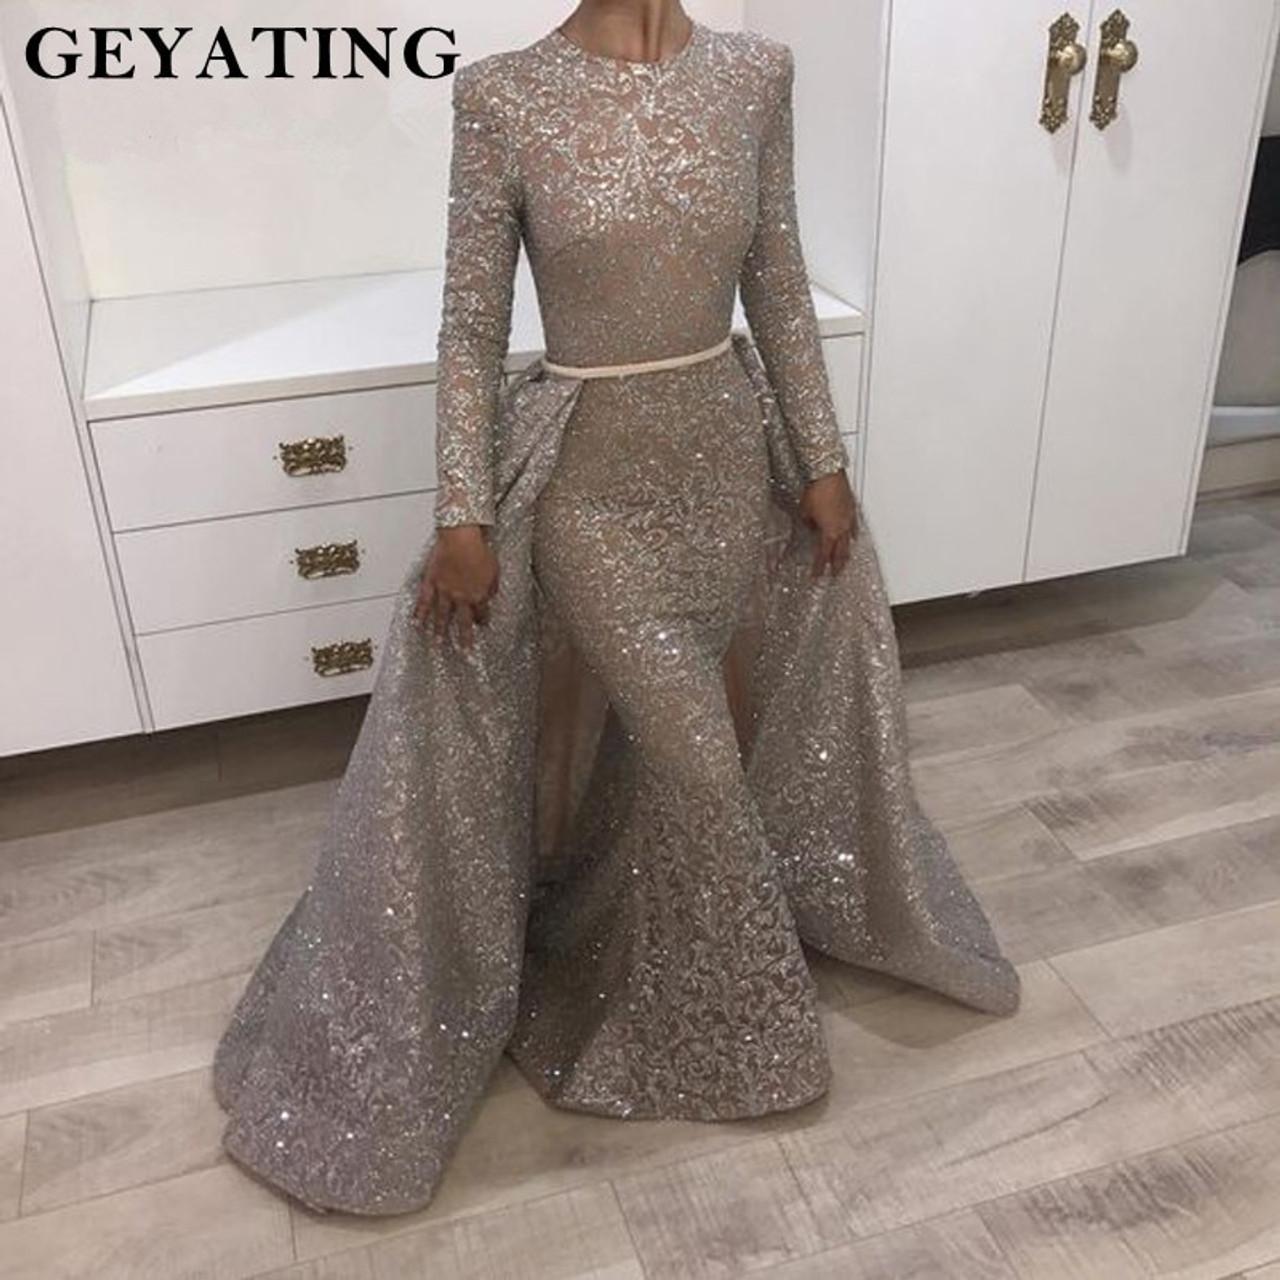 9248a84ddfd65 ... Yousef Aljasmi Long Sleeve Evening Dress 2018 Muslim Detachable Train  Women Formal Evening Gowns Dubai Long ...